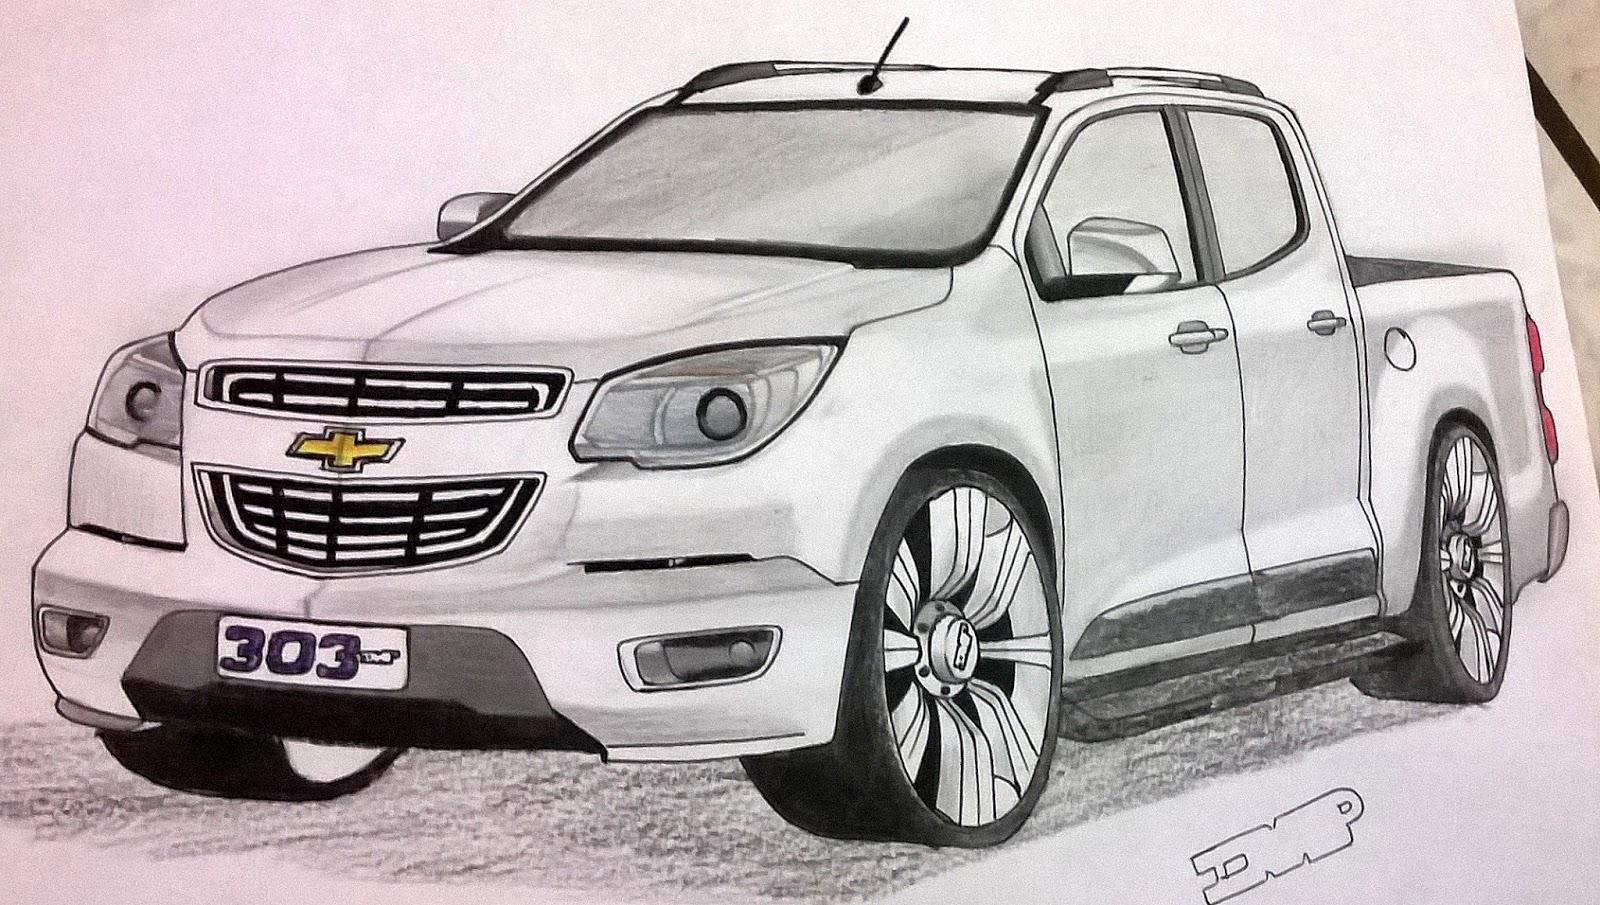 Favoritos Chevrolet S10 Rebaixada | Ismael Desenhos JW04